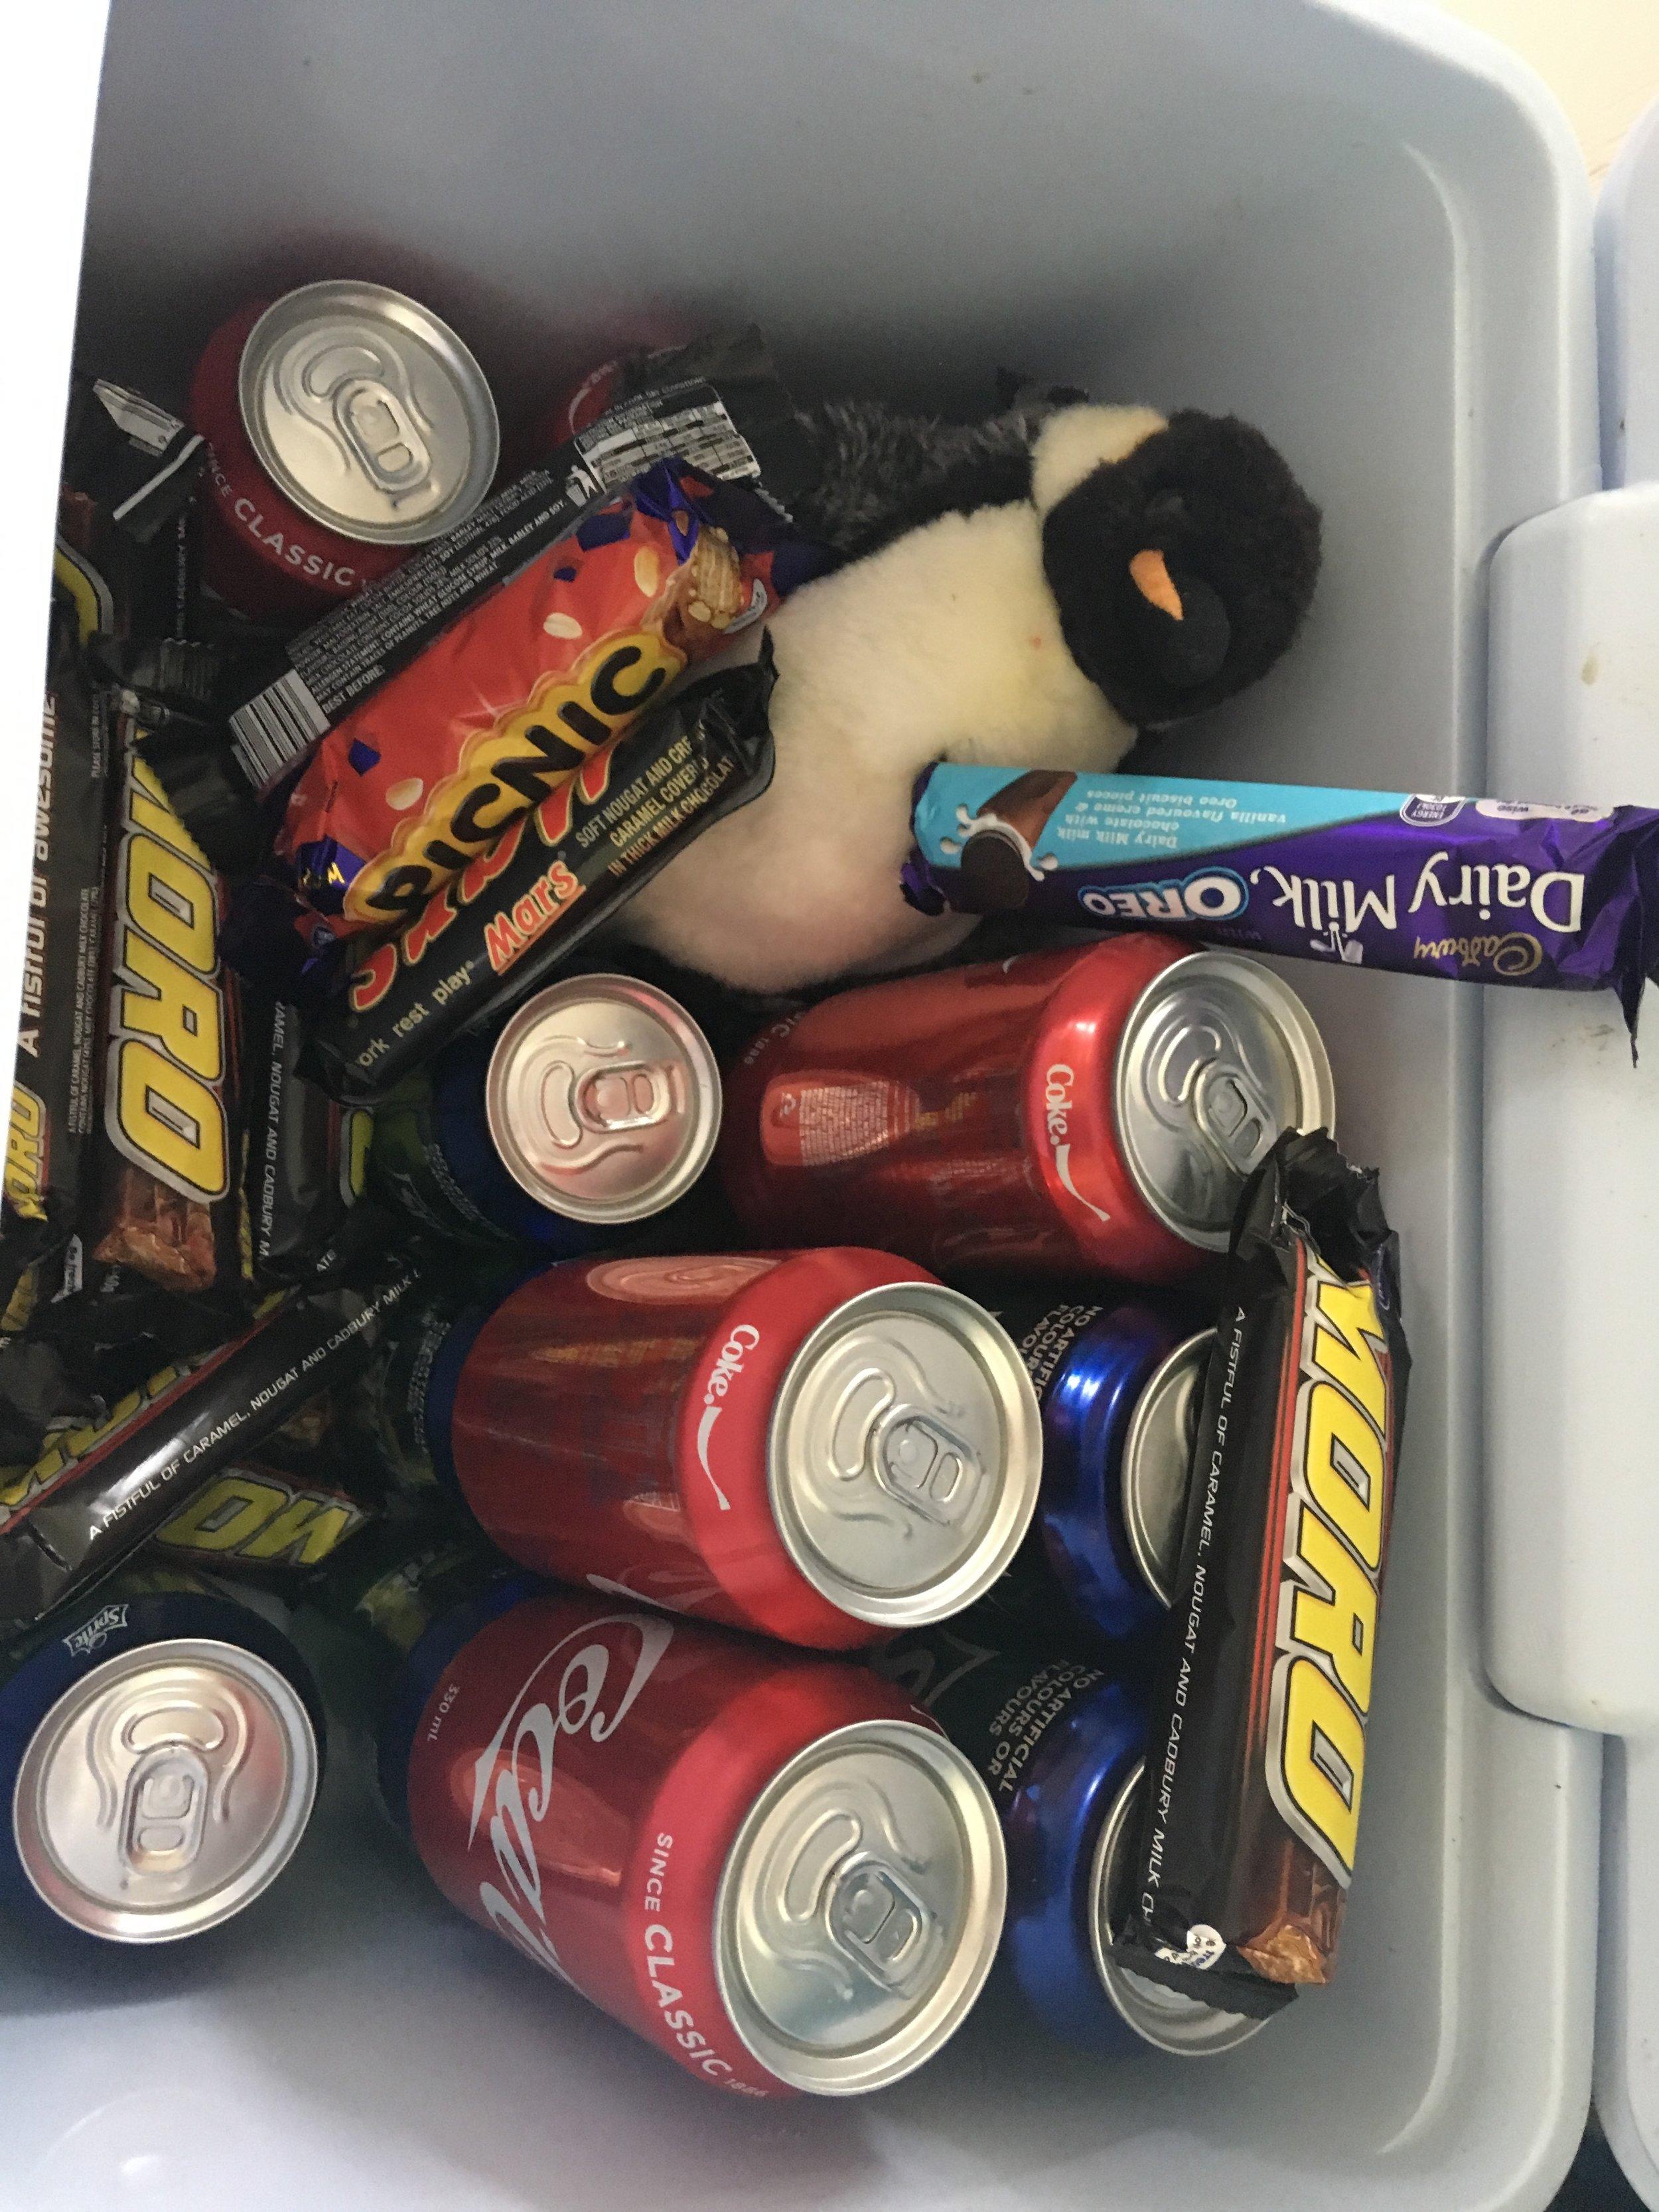 Philip in the snack box